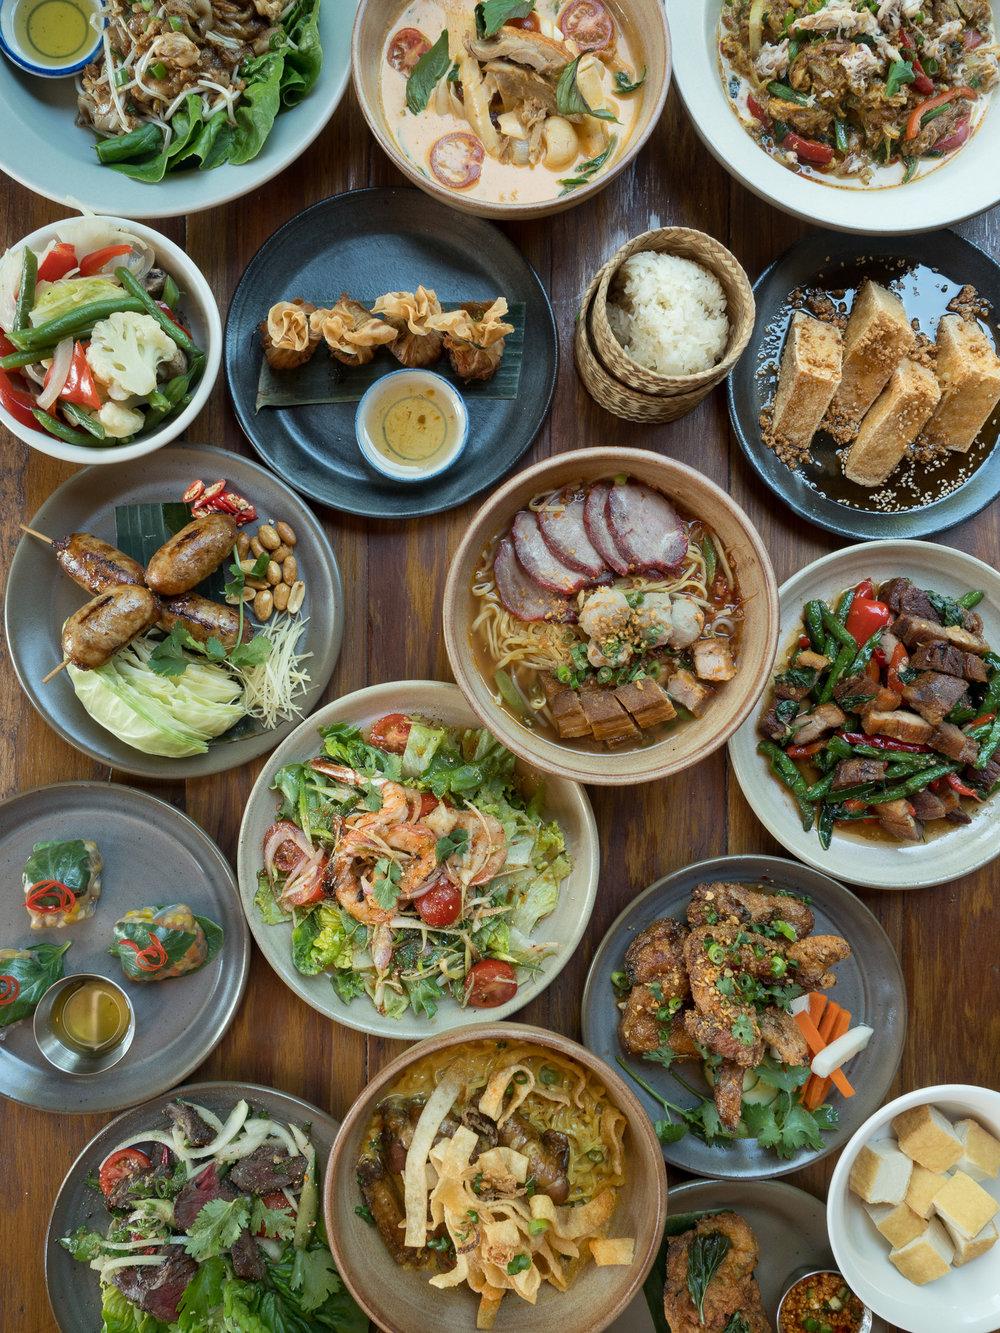 5 paadee portland pdx food photo photography styling foodie thai jeremy pawlowski eats eatsportland eatsamerica cheap